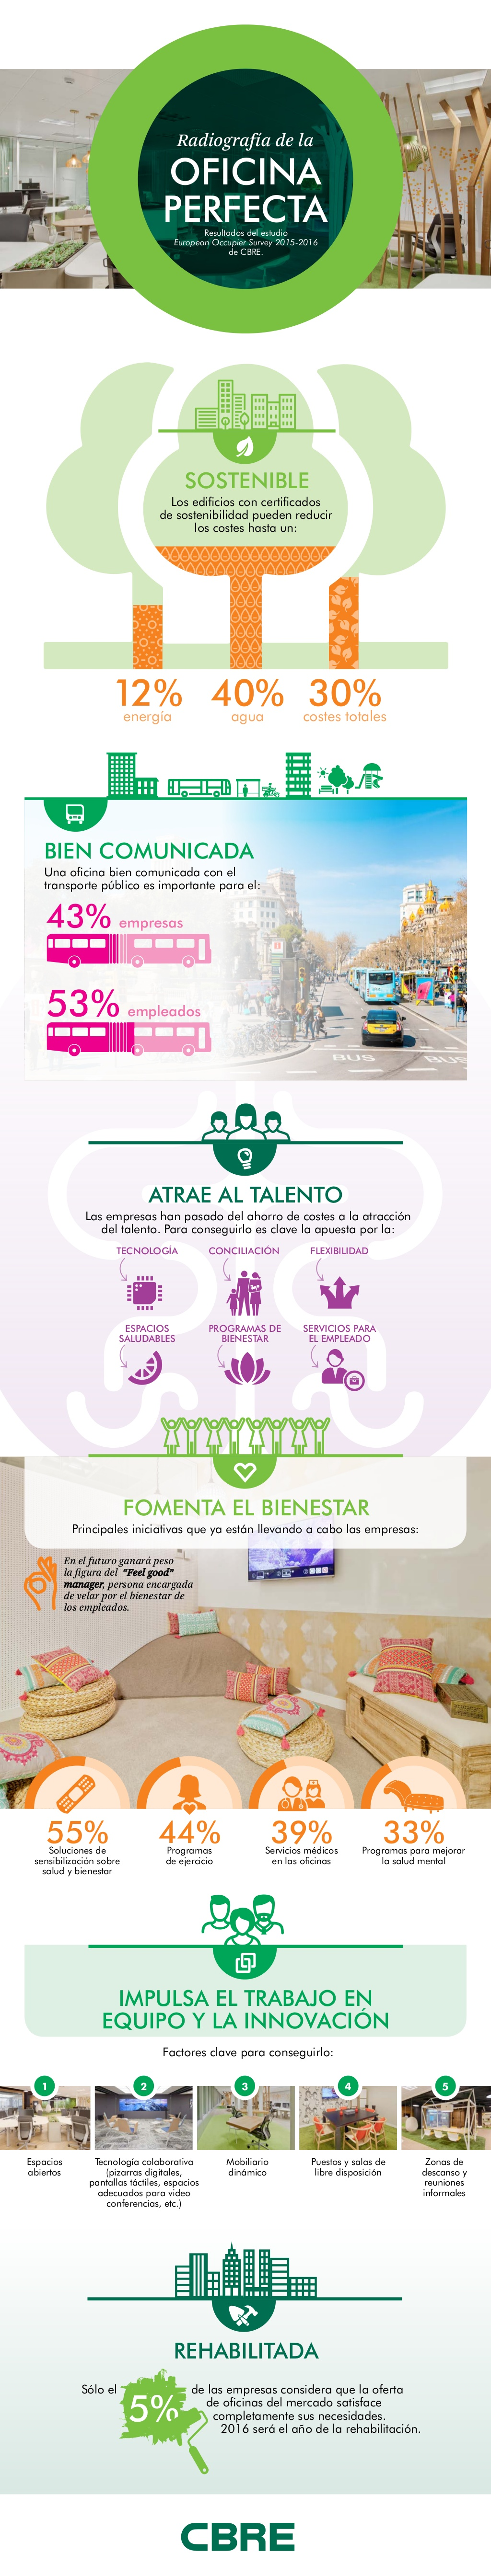 Radiografía de la Oficina Perfecta #infografia #infographic #rrhh